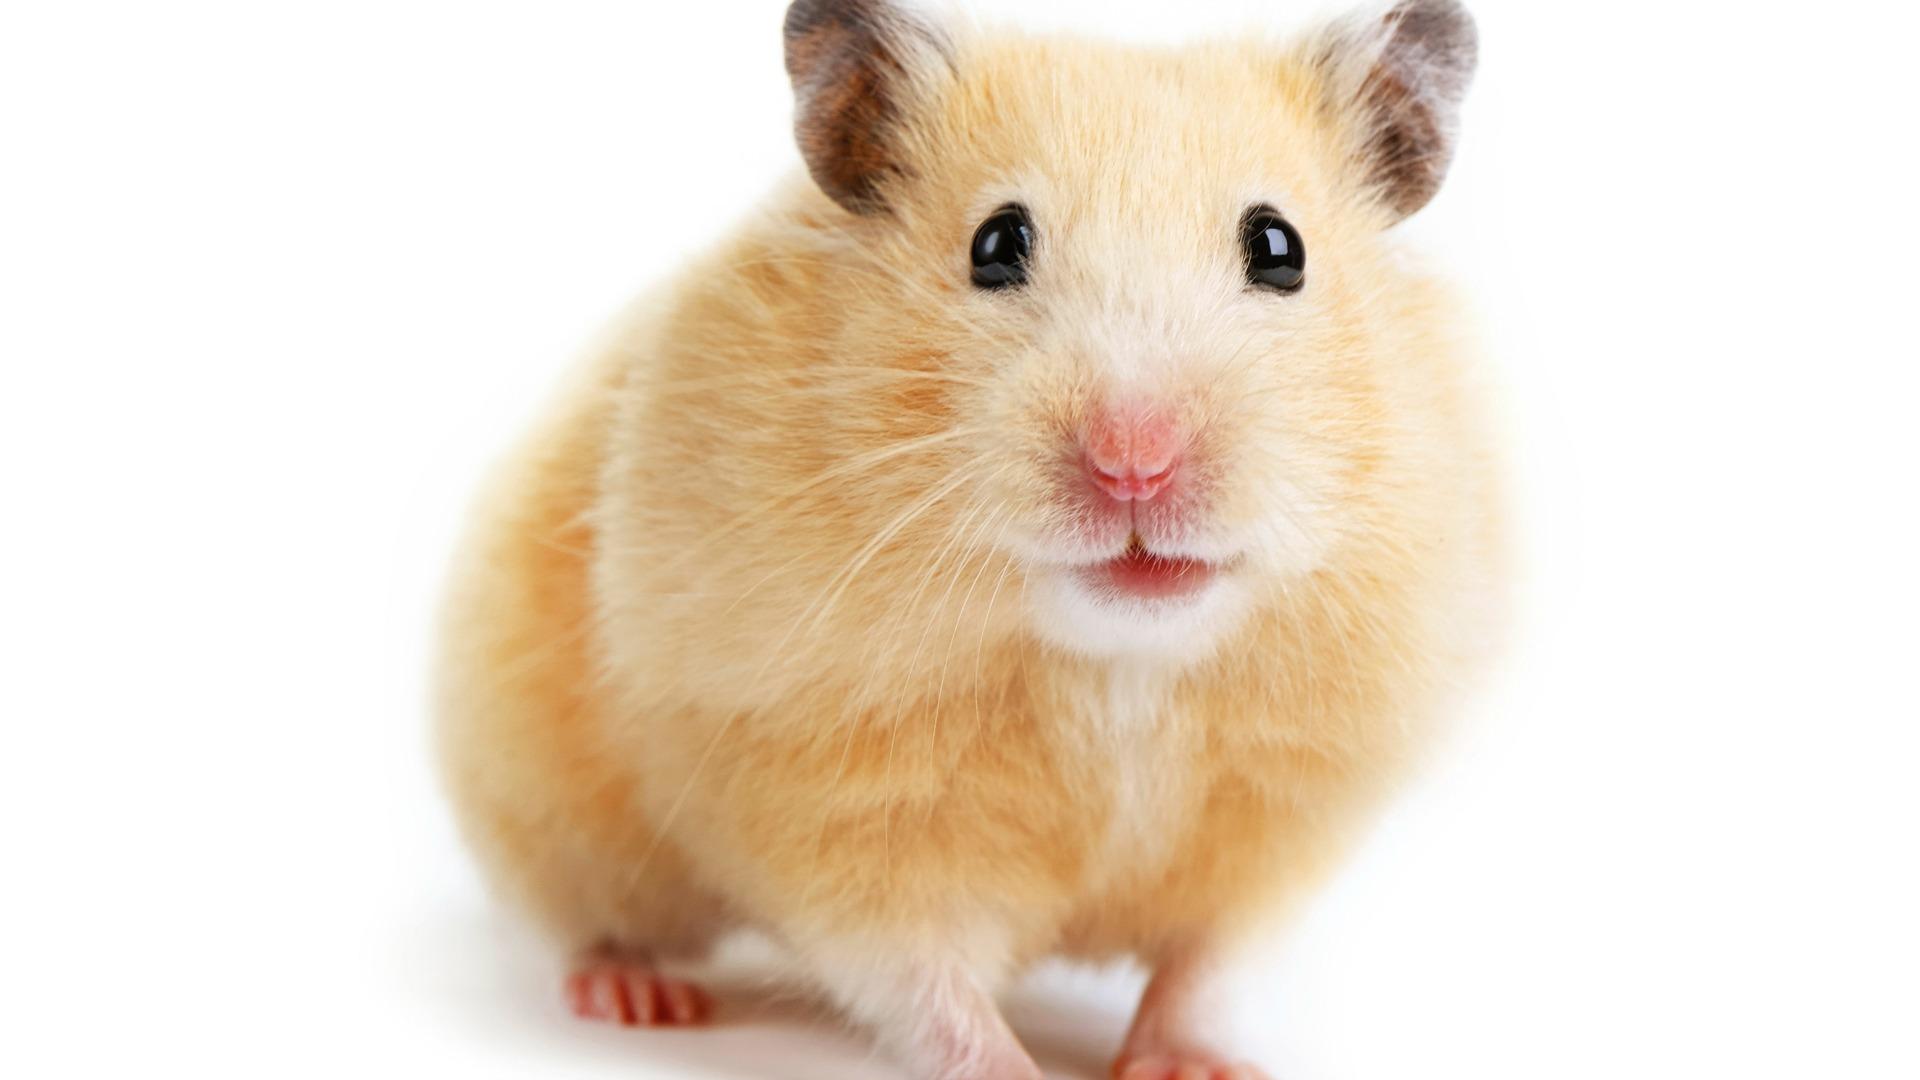 Hamster PNG HD - 125457